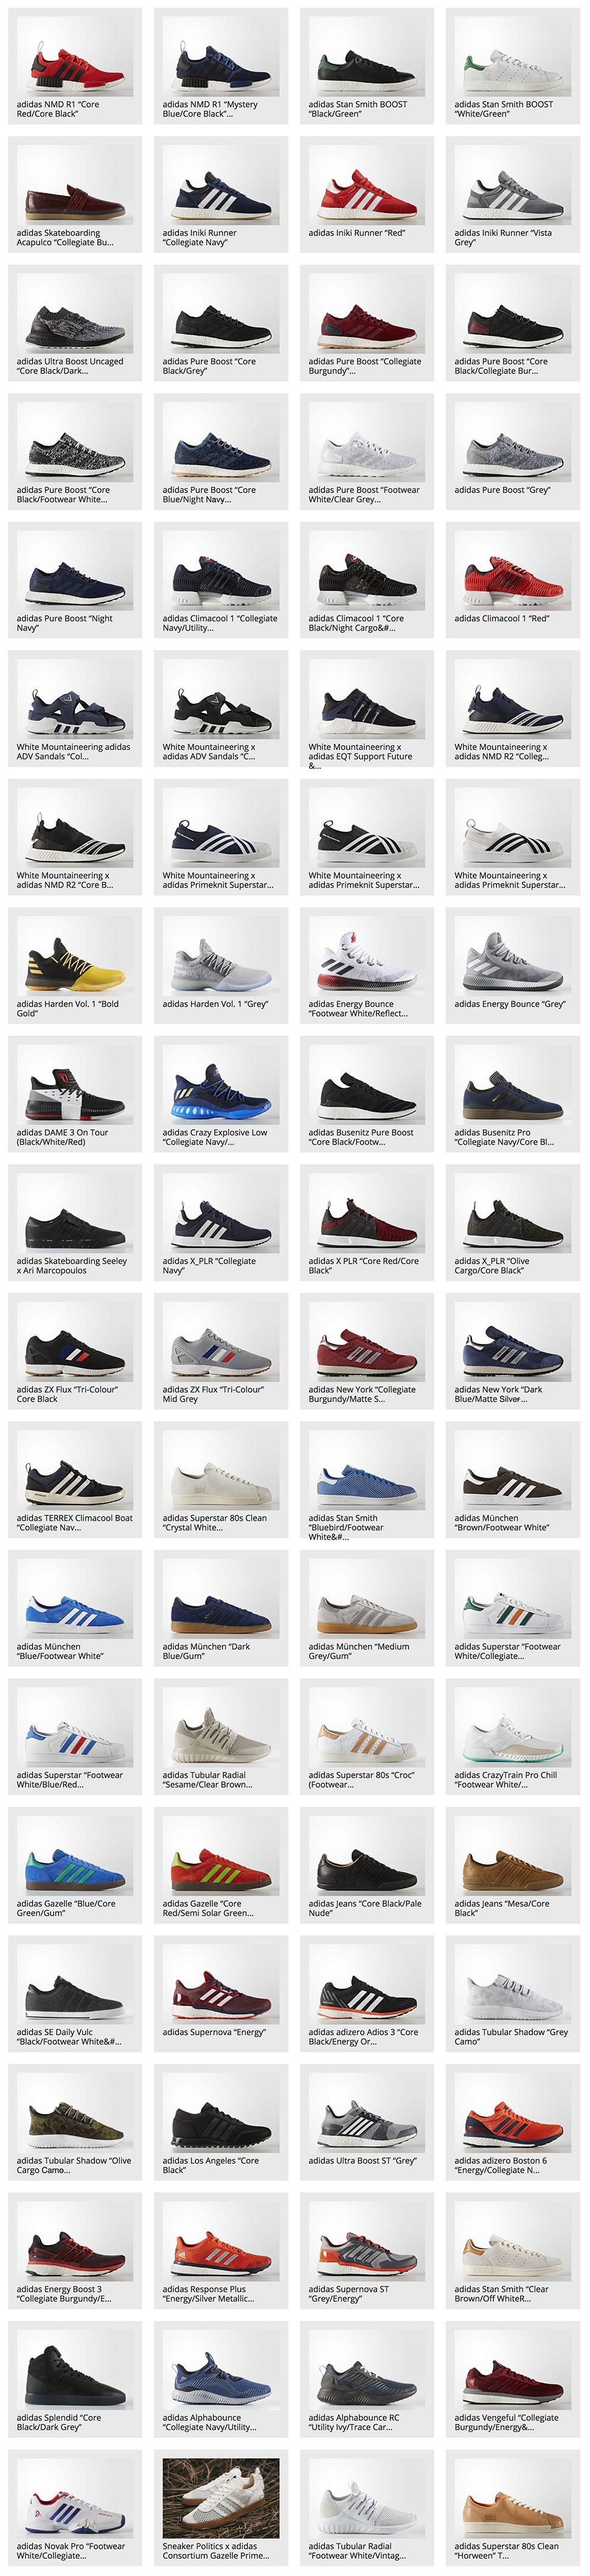 adidasshoes$29 on in 2019 | random | Adidas sneakers, Adidas